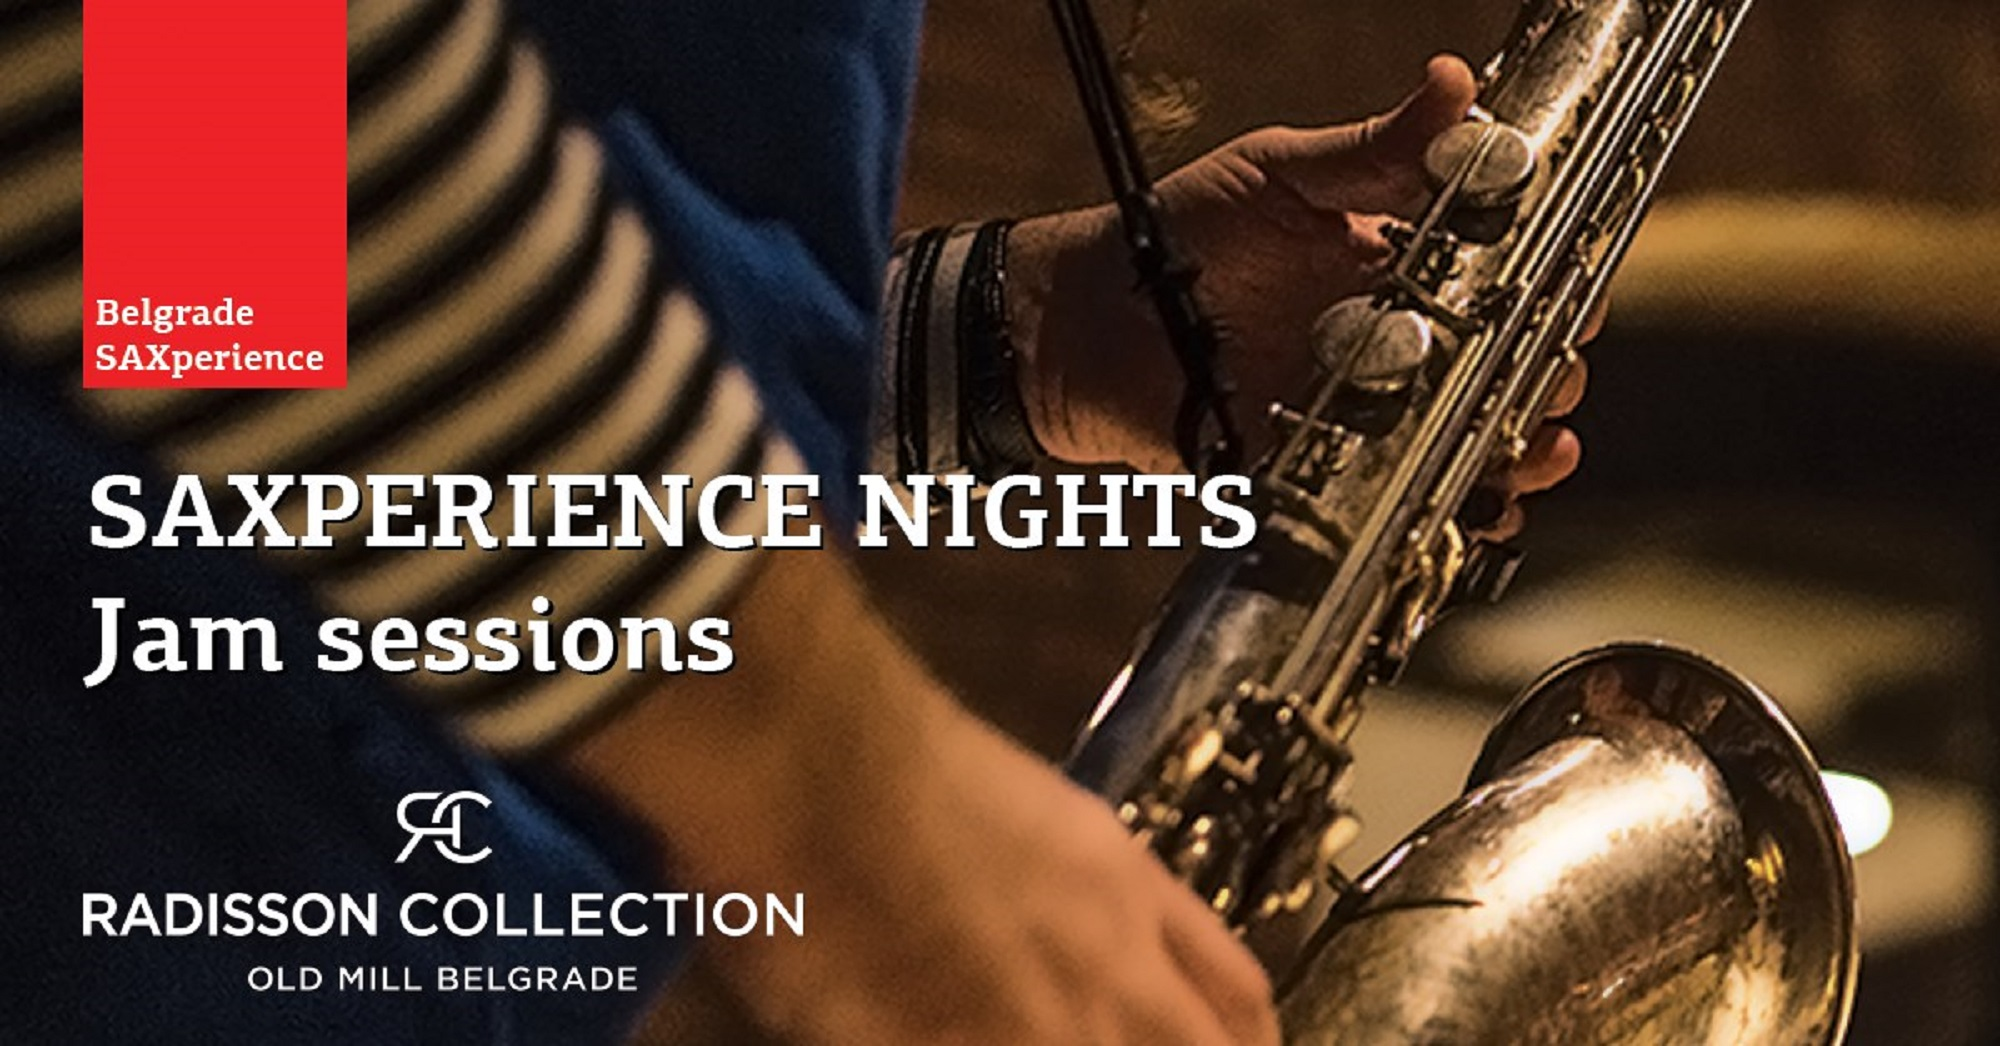 BG SAXperience: vrhunski saksofonisti na džem sešn svirkama